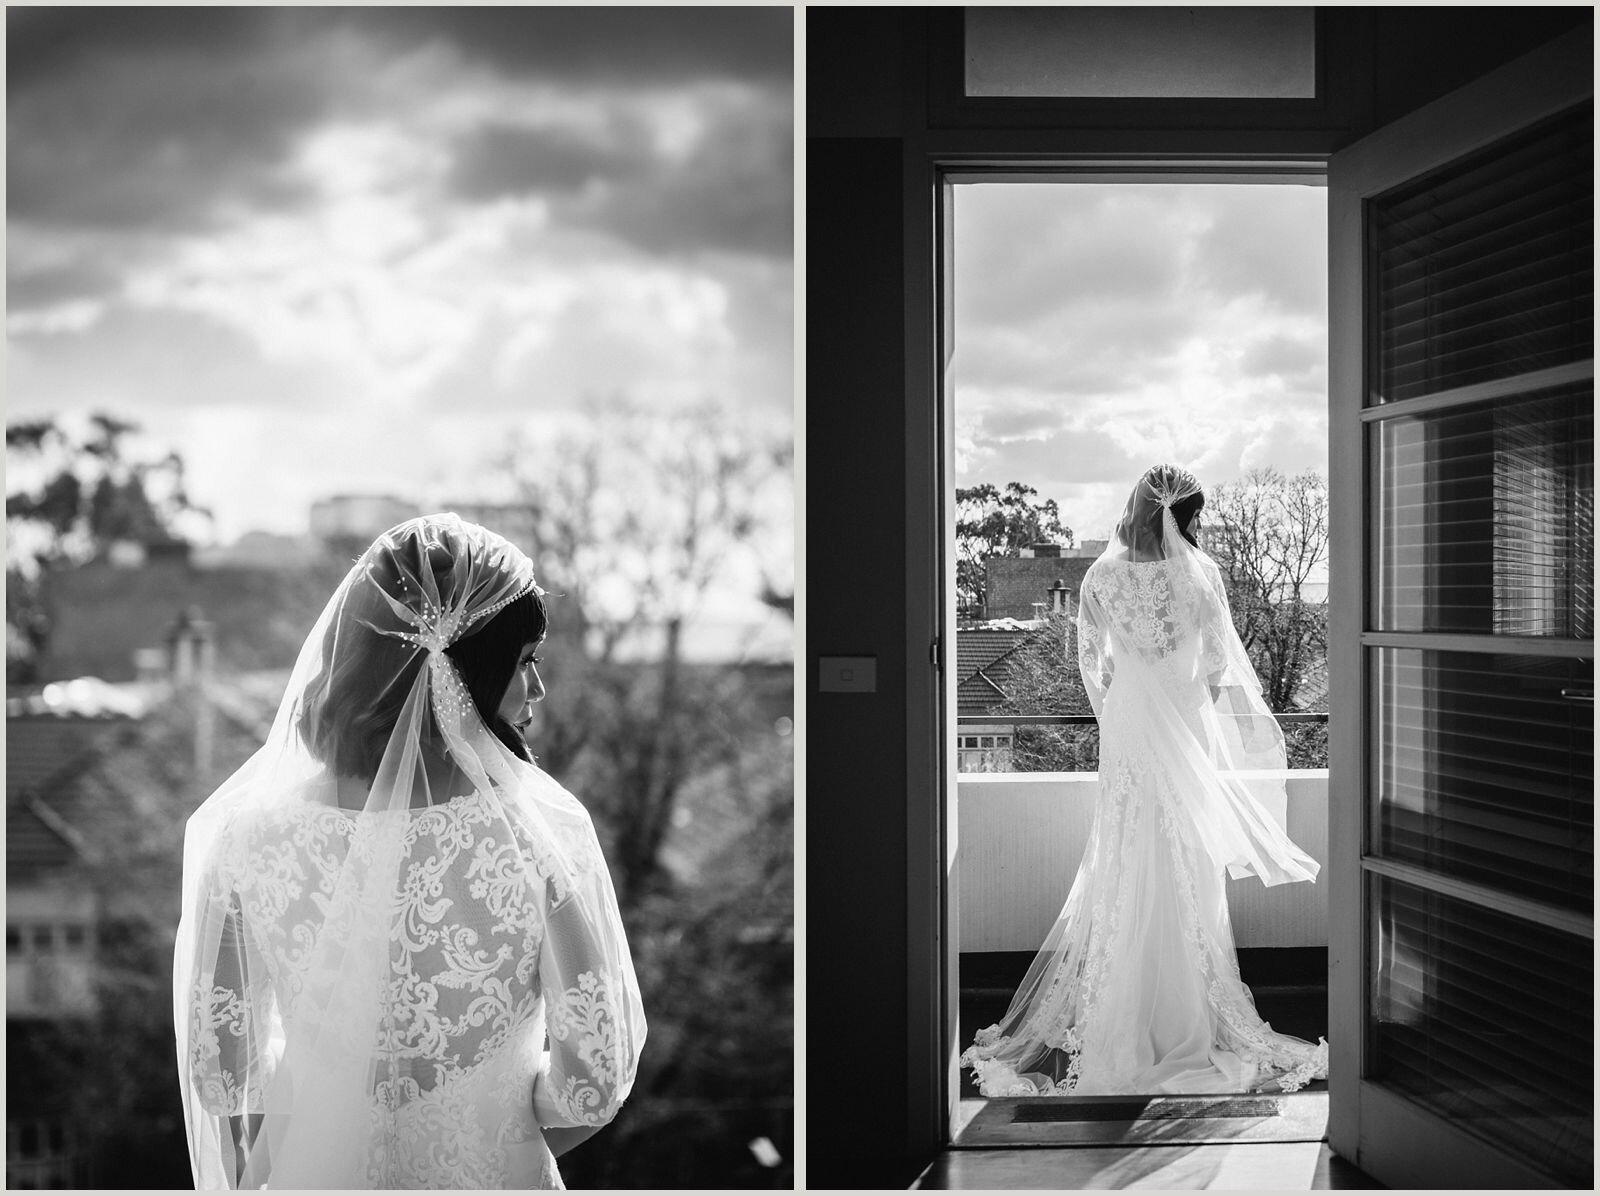 joseph_koprek_wedding_melbourne_the_prince_deck_0015.jpg